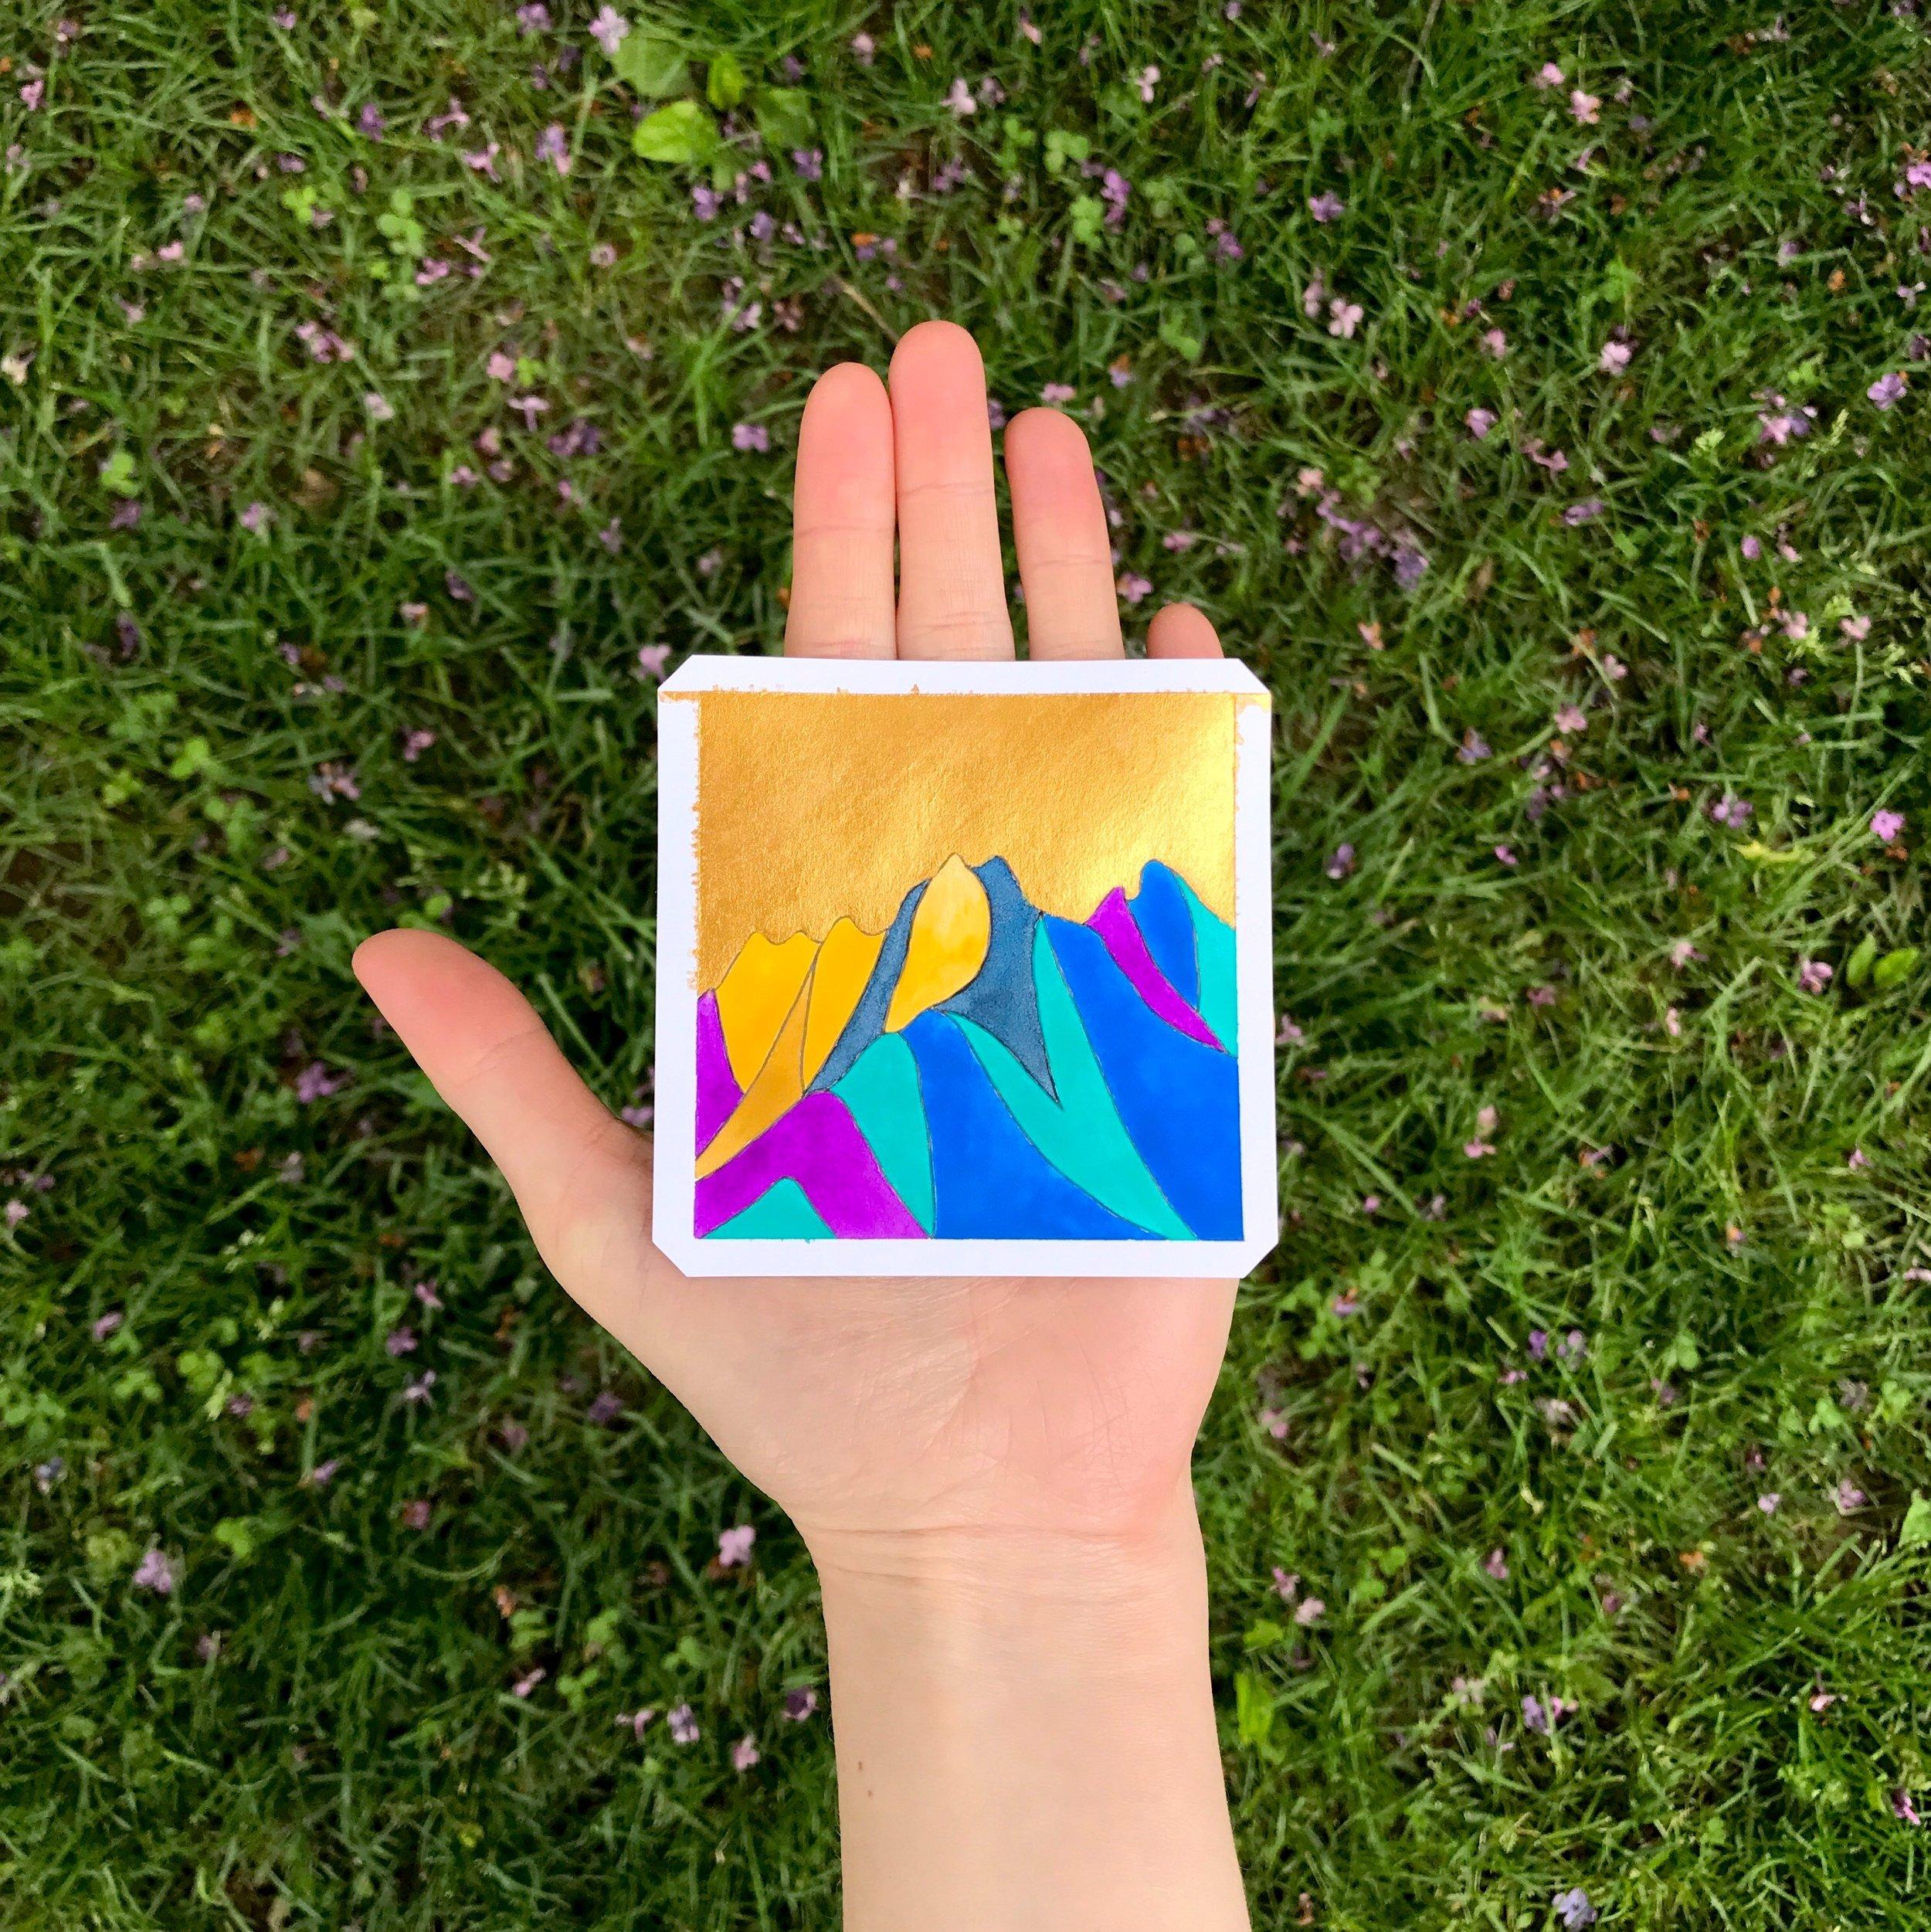 Imaginary Mountains III (Sold)